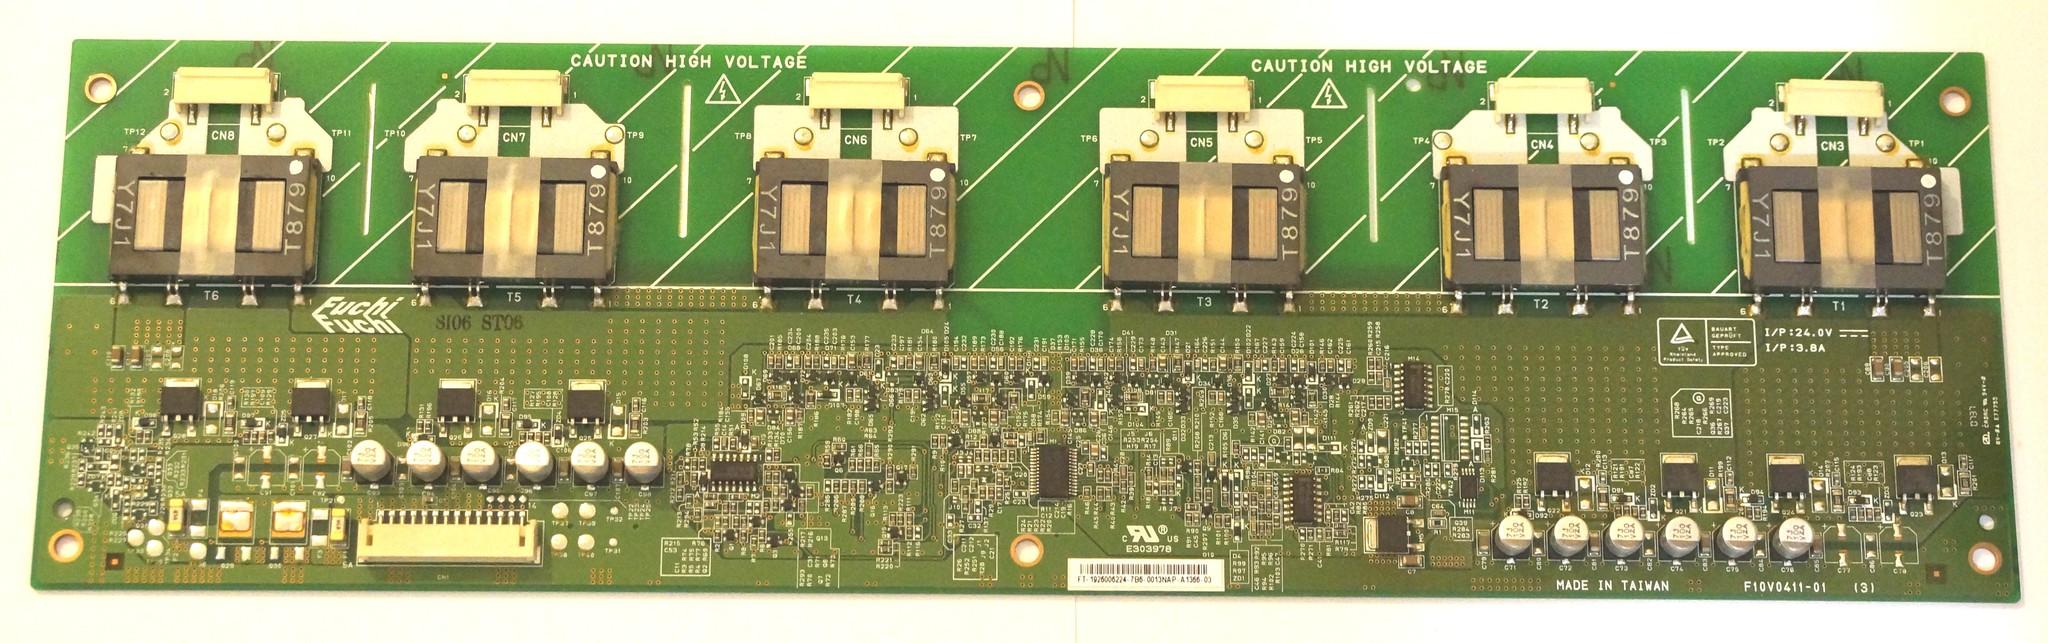 f10v0411-01 (3)  инвертор телевизора Toshiba